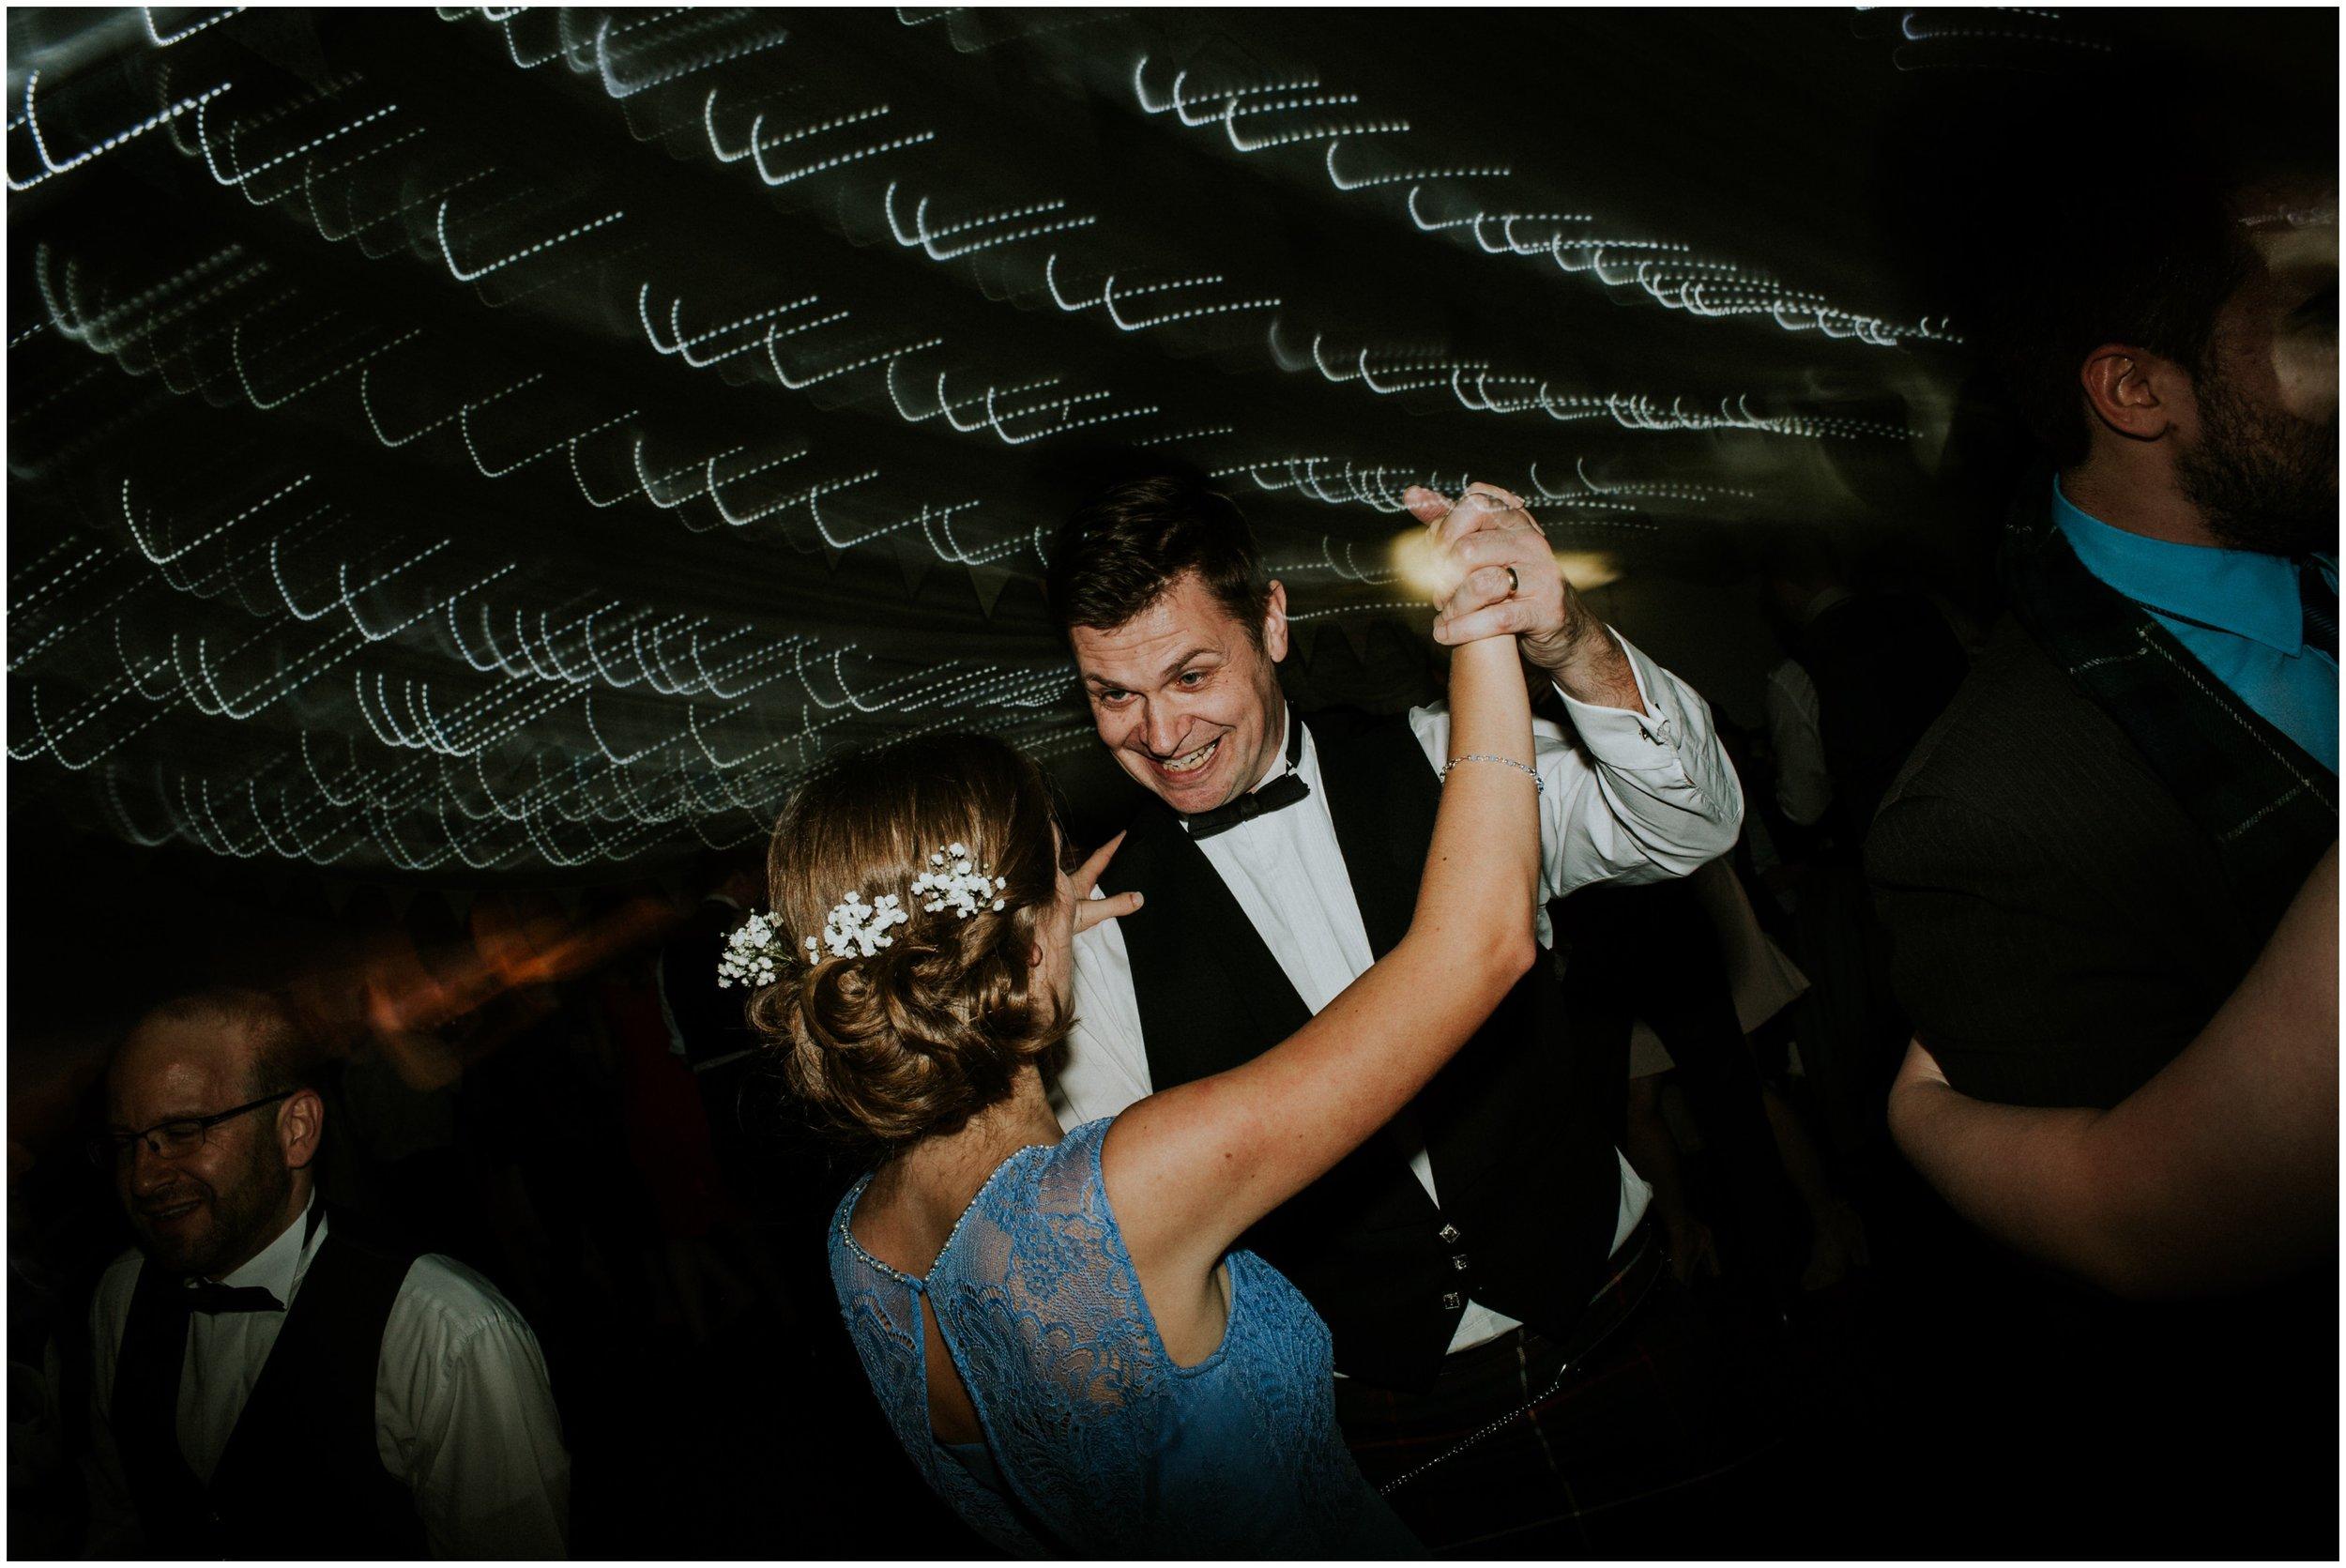 Photography 78 - Glasgow Wedding Photographer - Dave & Alana_0105.jpg